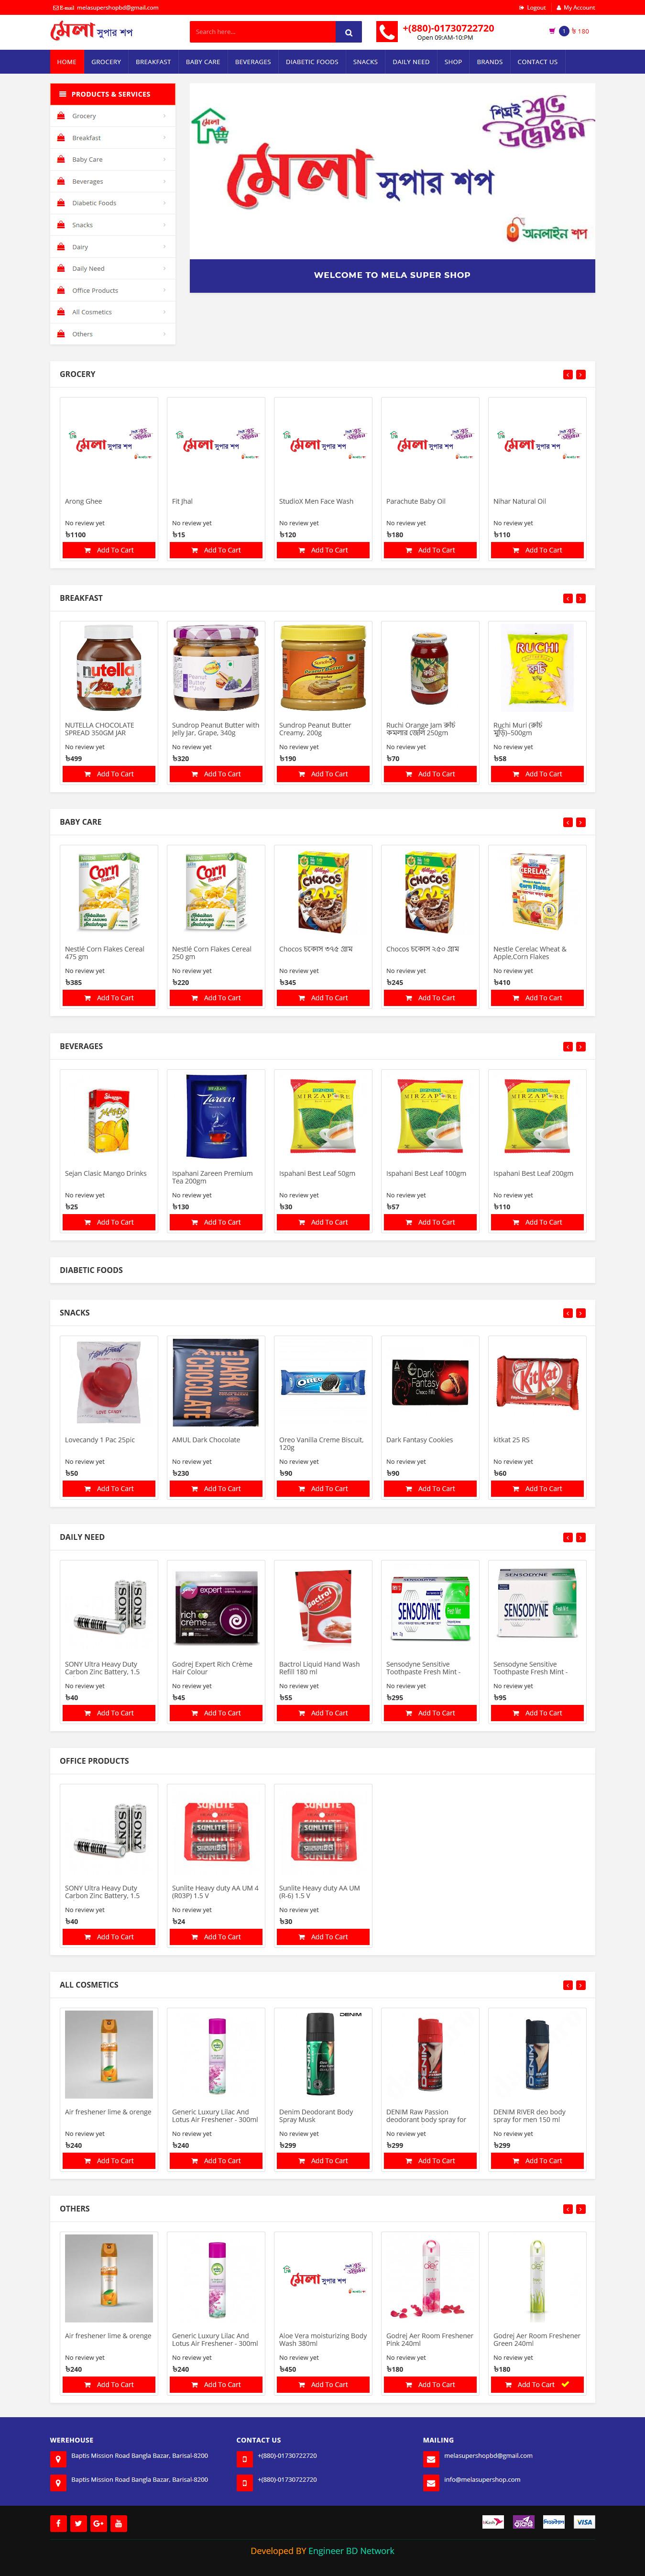 Super shop E-commerce Web Application & POS